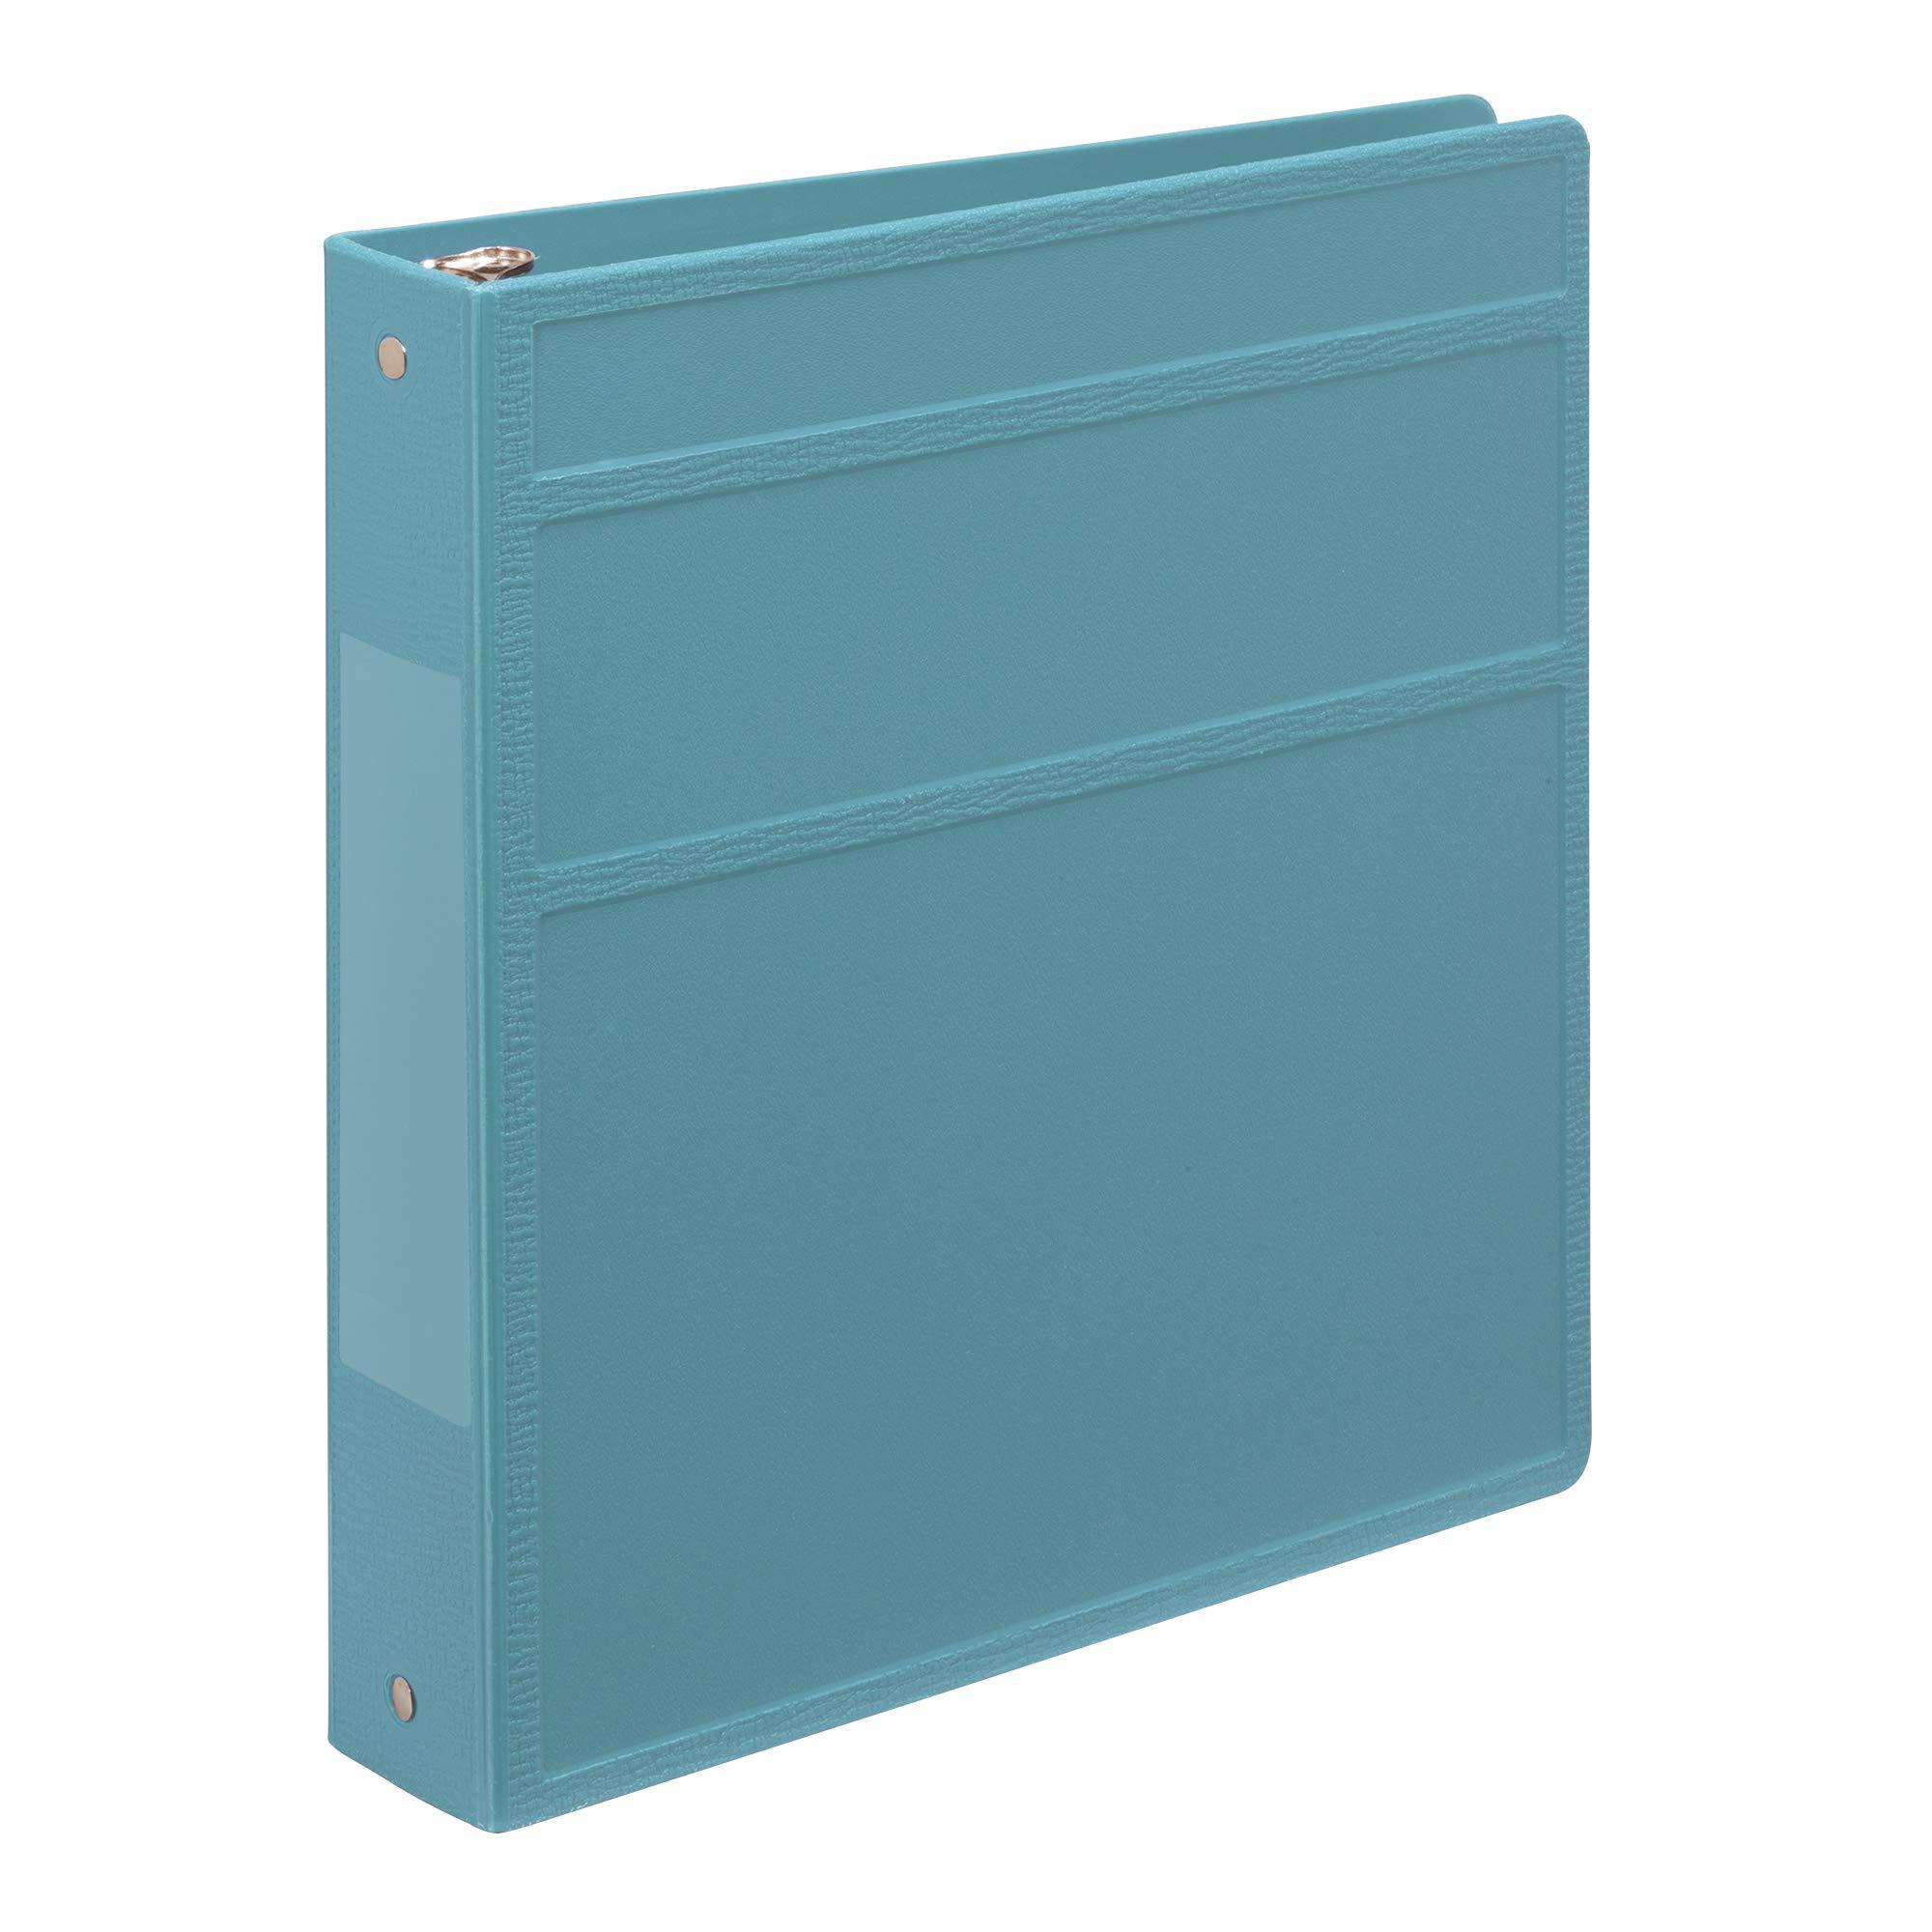 Carstens 1.5- Inch Heavy Duty 3-Ring Binder - Side Opening, Powder Blue